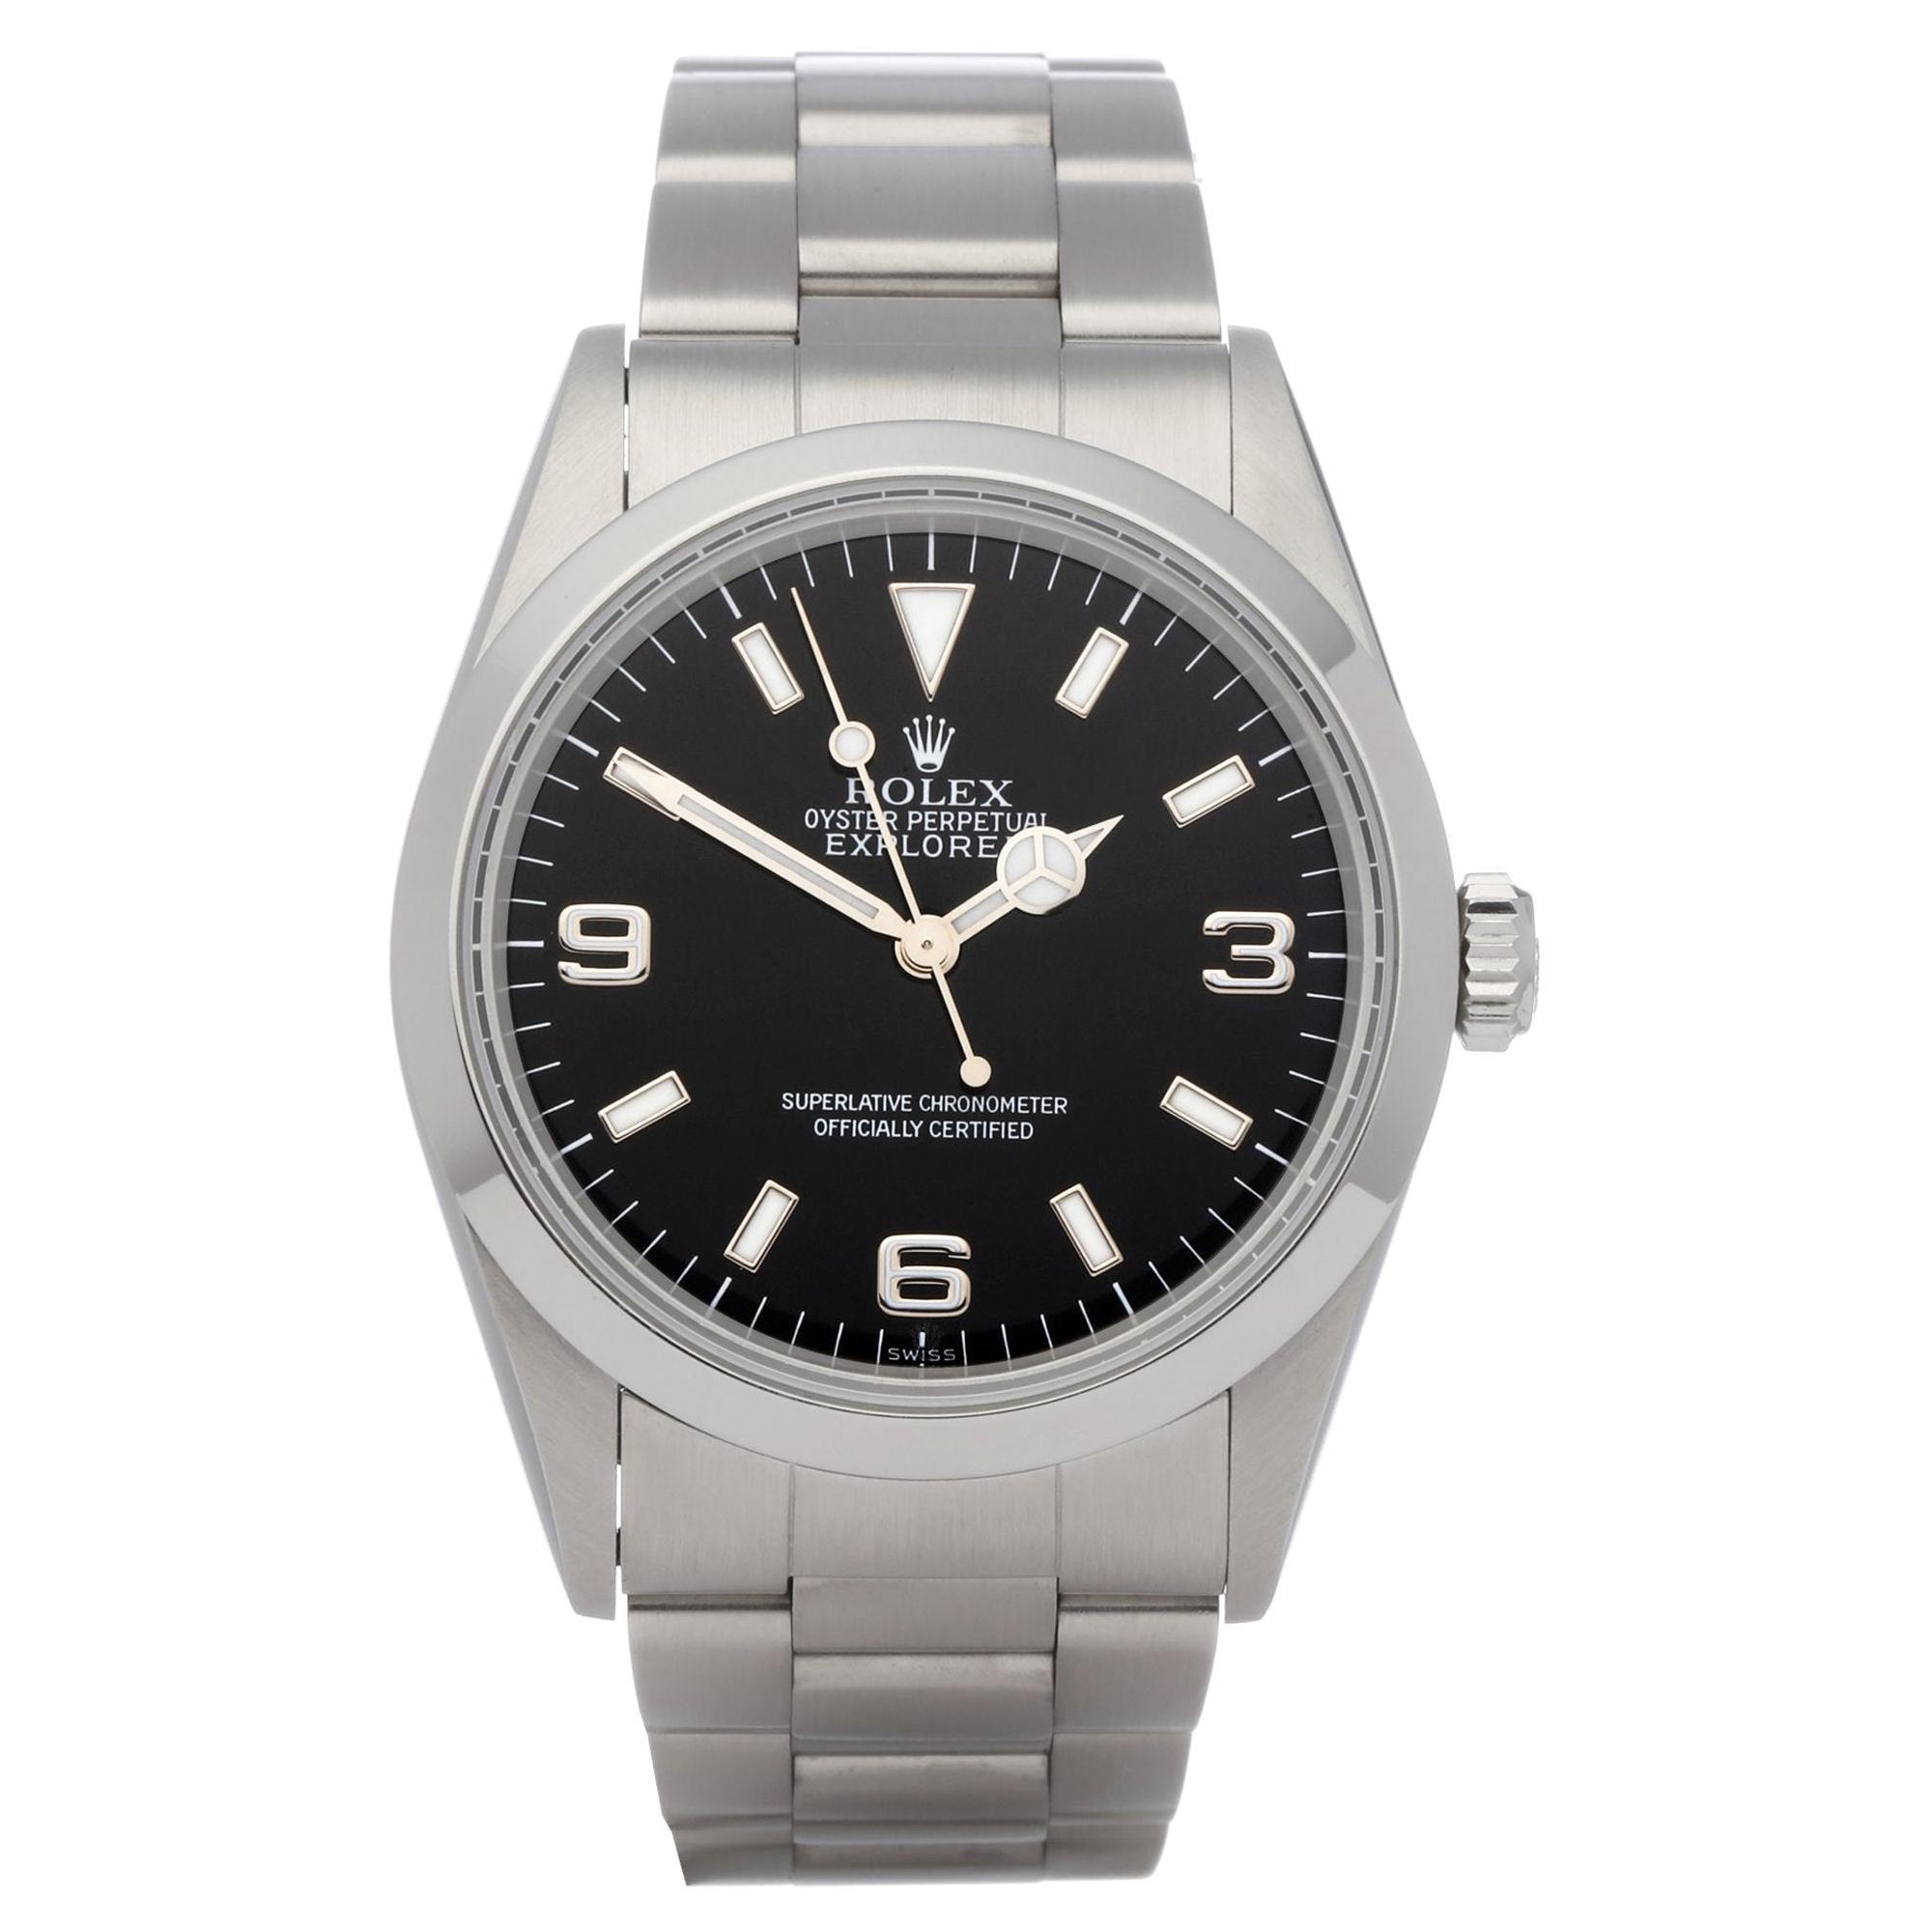 Rolex Explorer 14270 Men's Stainless Steel Watch